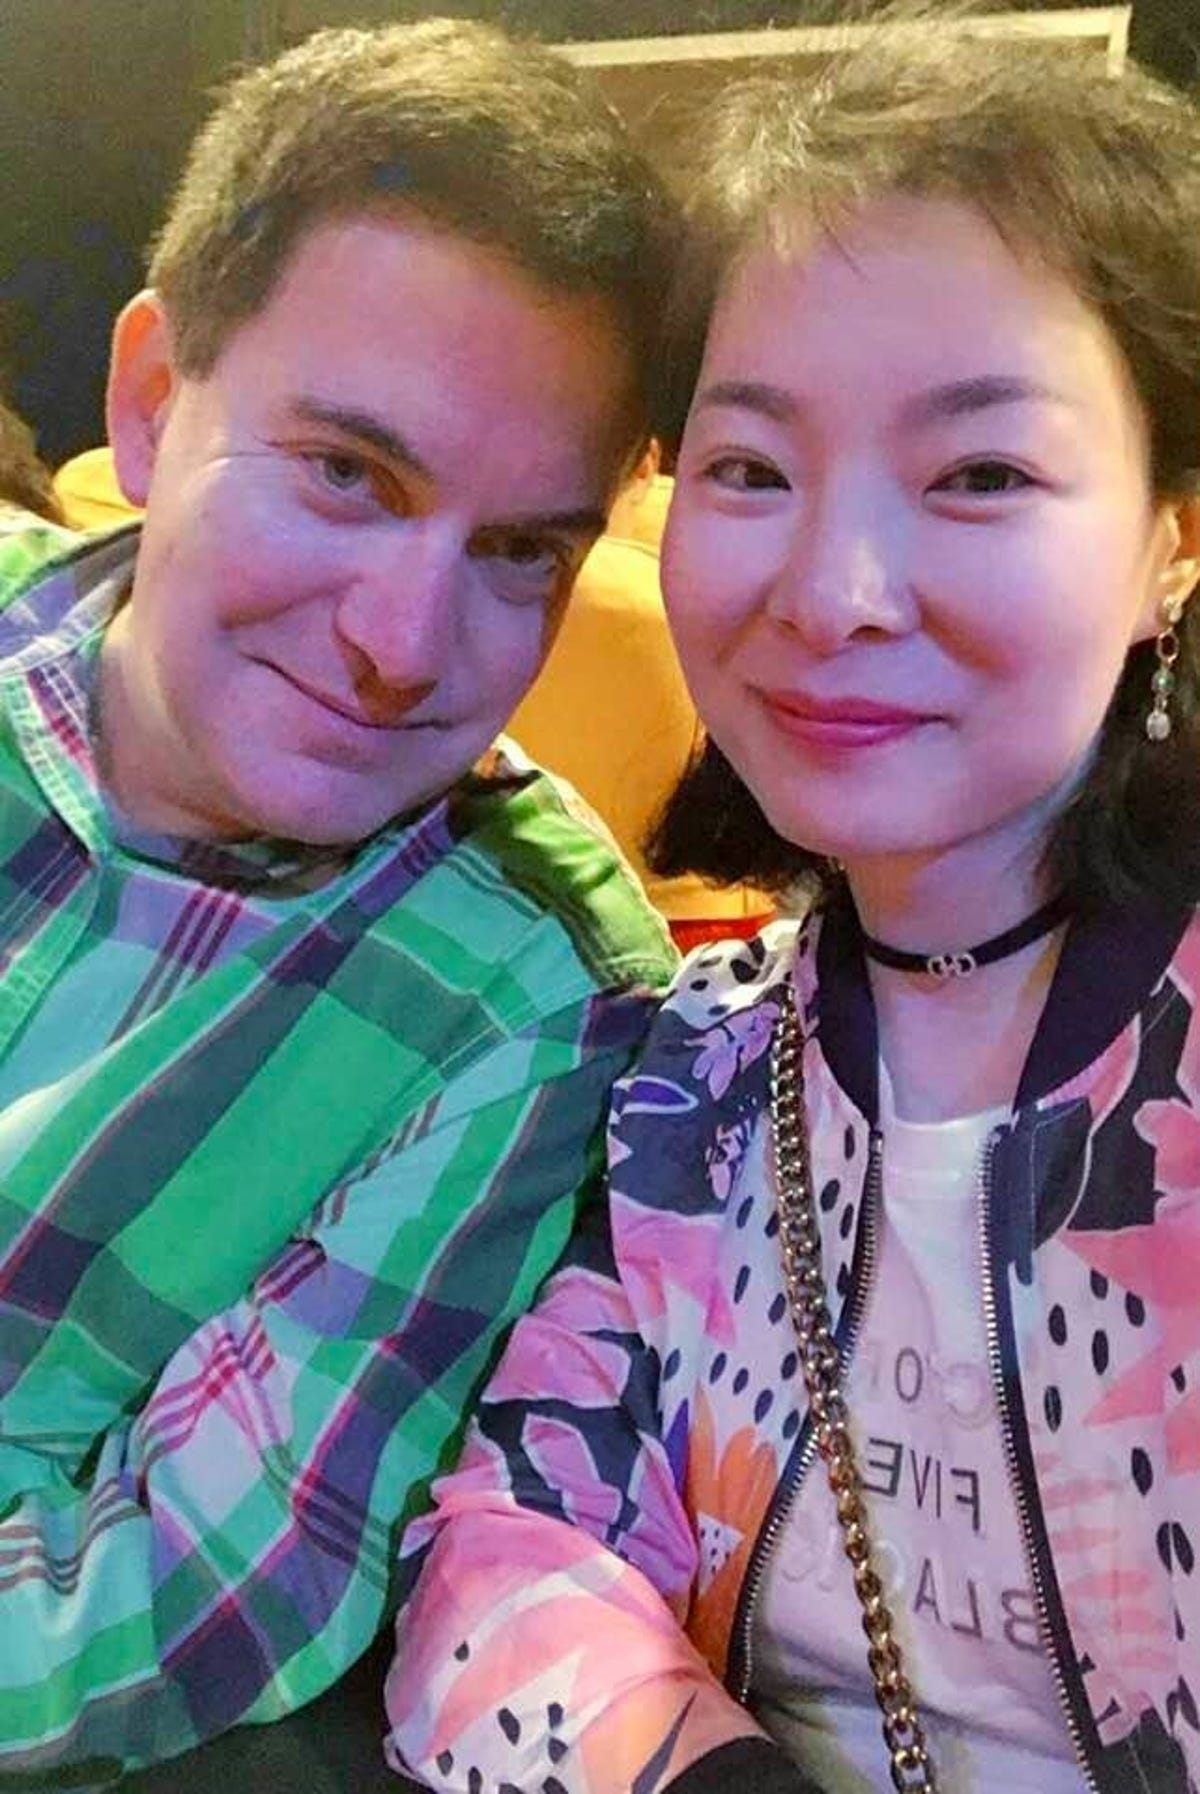 Wisconsin man sues over Chinese fiancée's visa denial